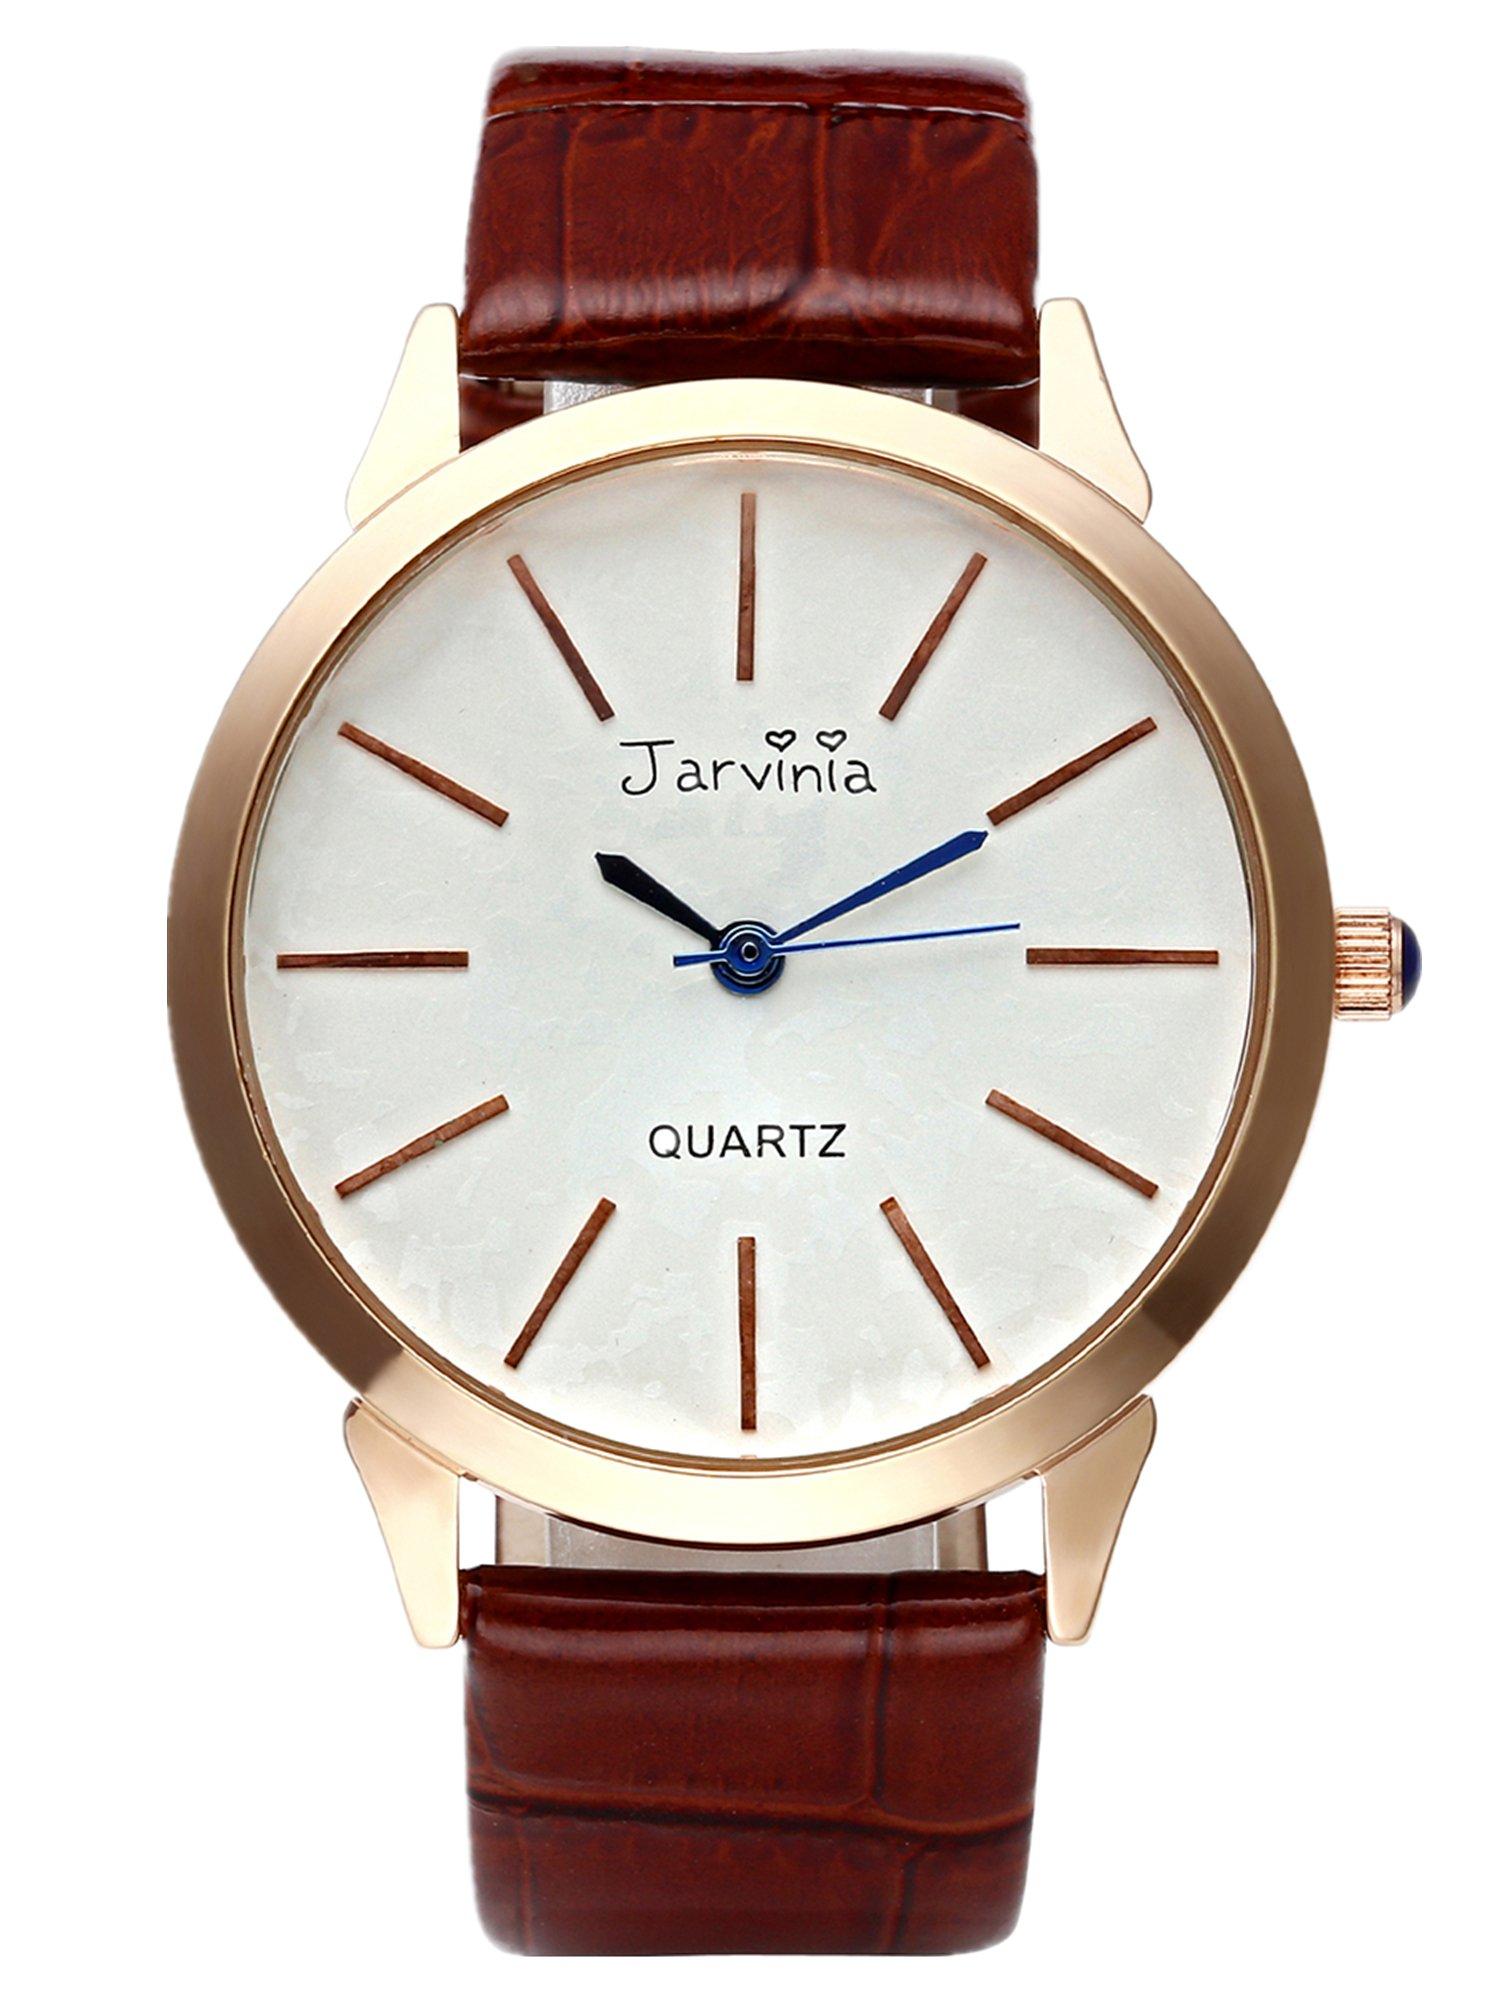 JSDDE Uhren,Elegant Frauen Armbanduhr Einfach Skala Damenuhr Echtleder Armband Rosegold Analog Qaurzuhr J626M,Braun